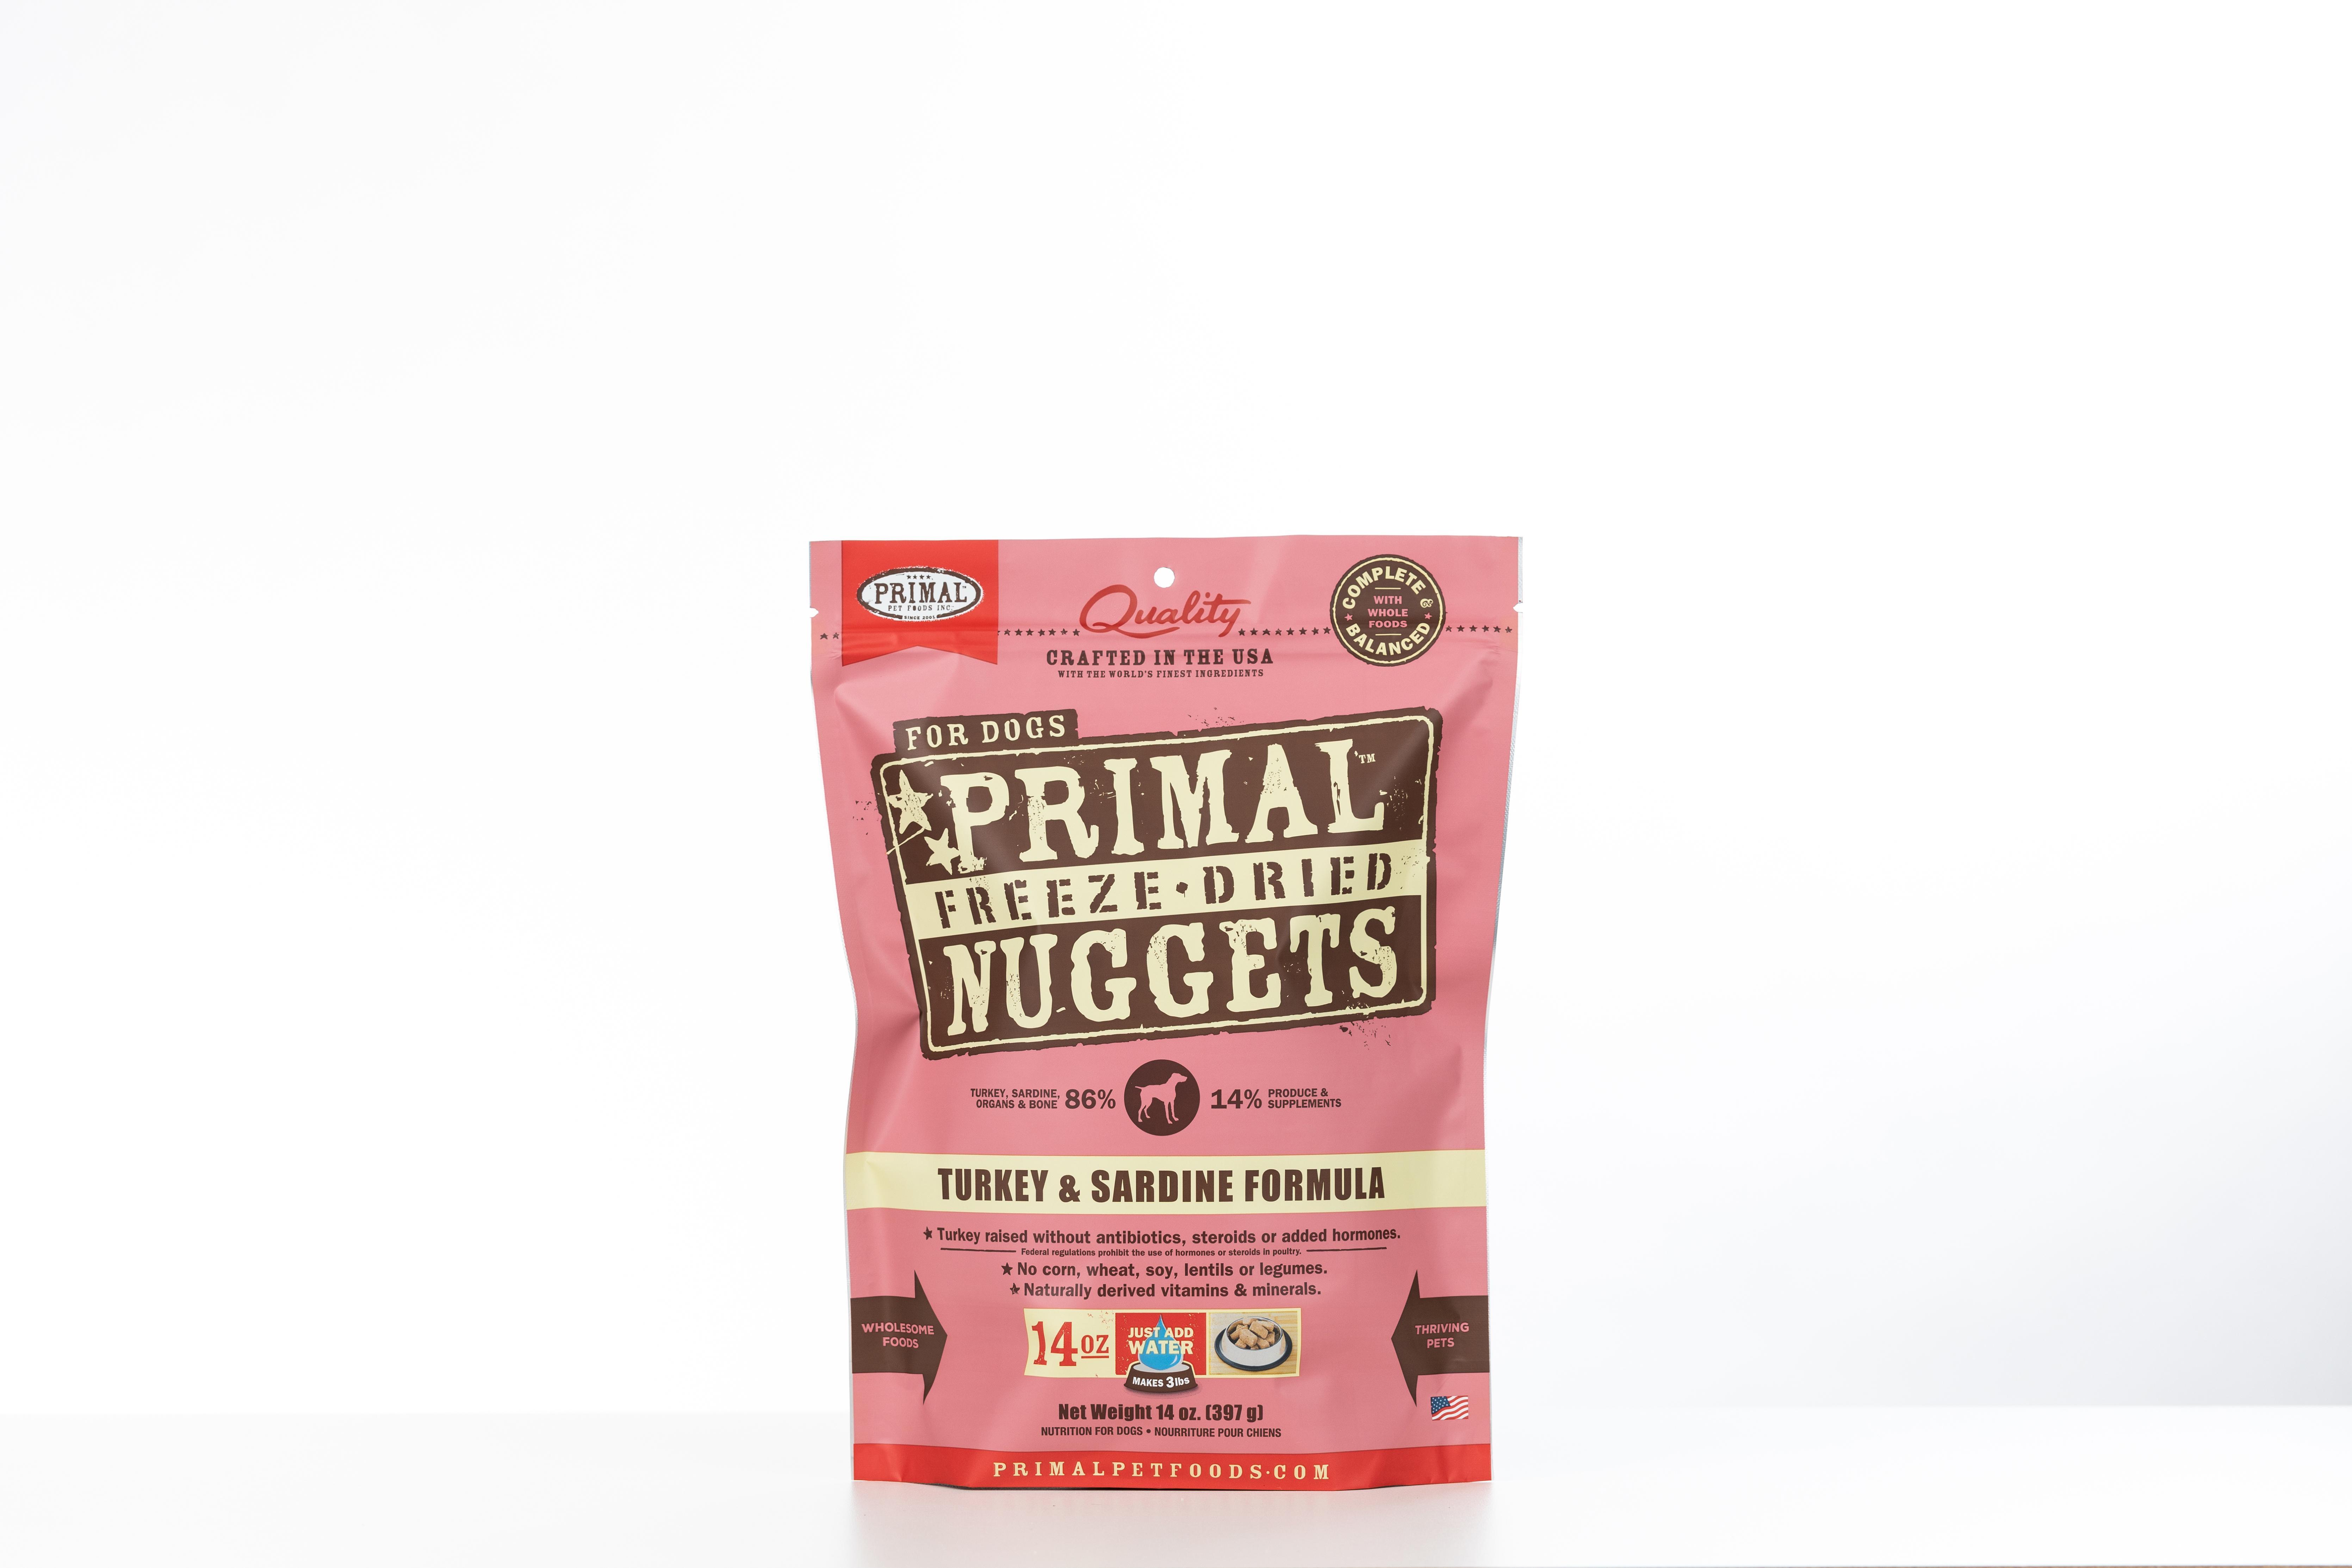 Primal Turkey & Sardine Formula Nuggets Grain-Free Raw Freeze-Dried Dog Food, 14-oz bag